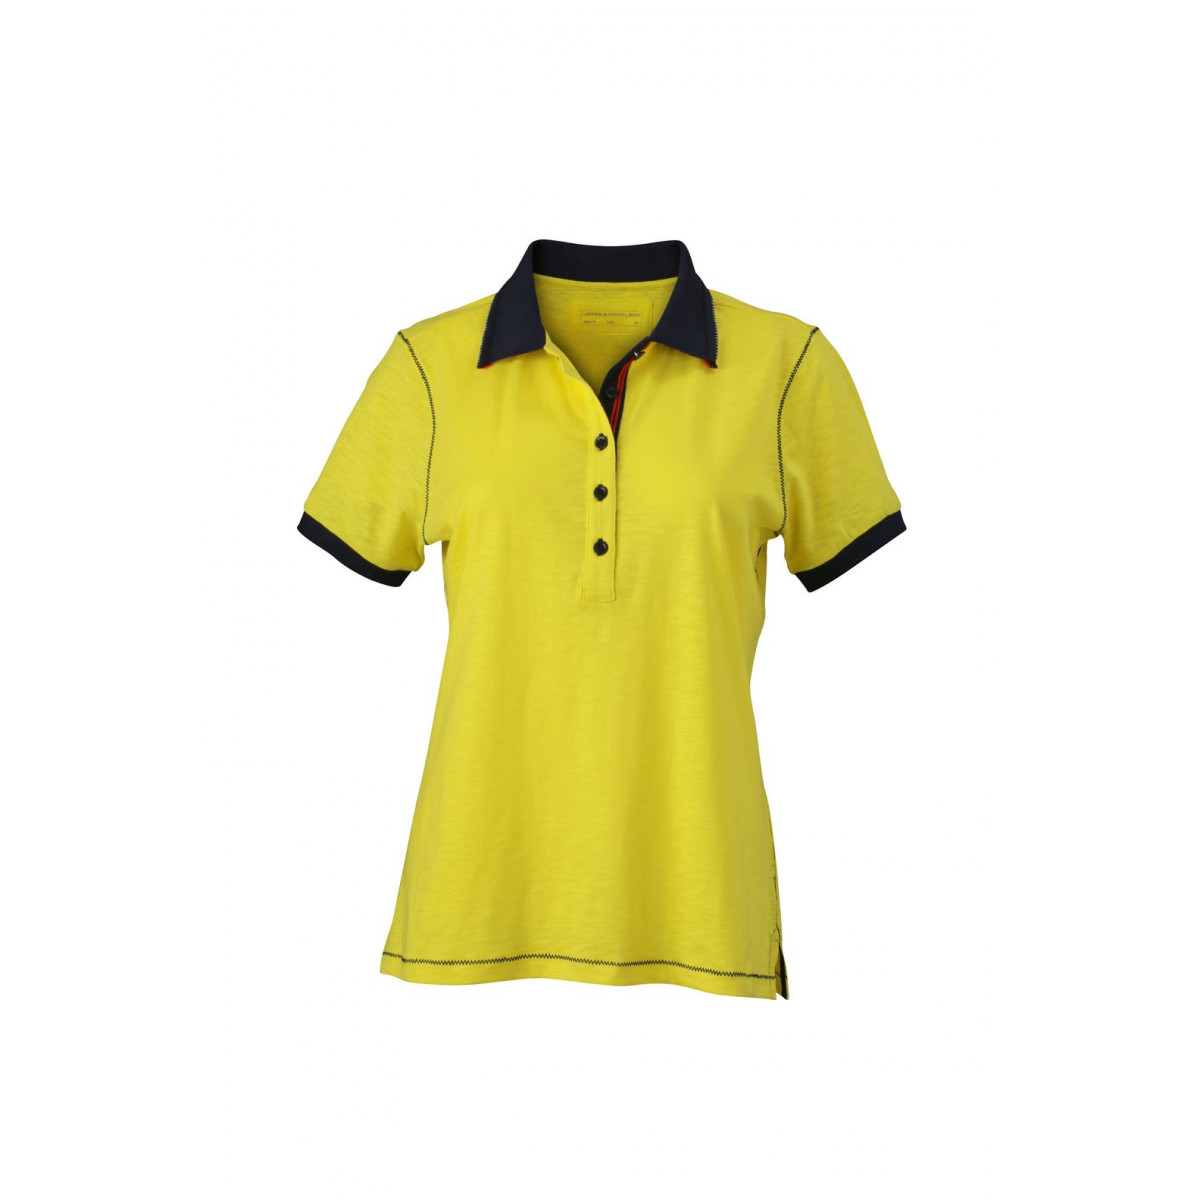 Рубашка поло женская JN979 Ladies Urban Polo - Желтый/Темно-синий